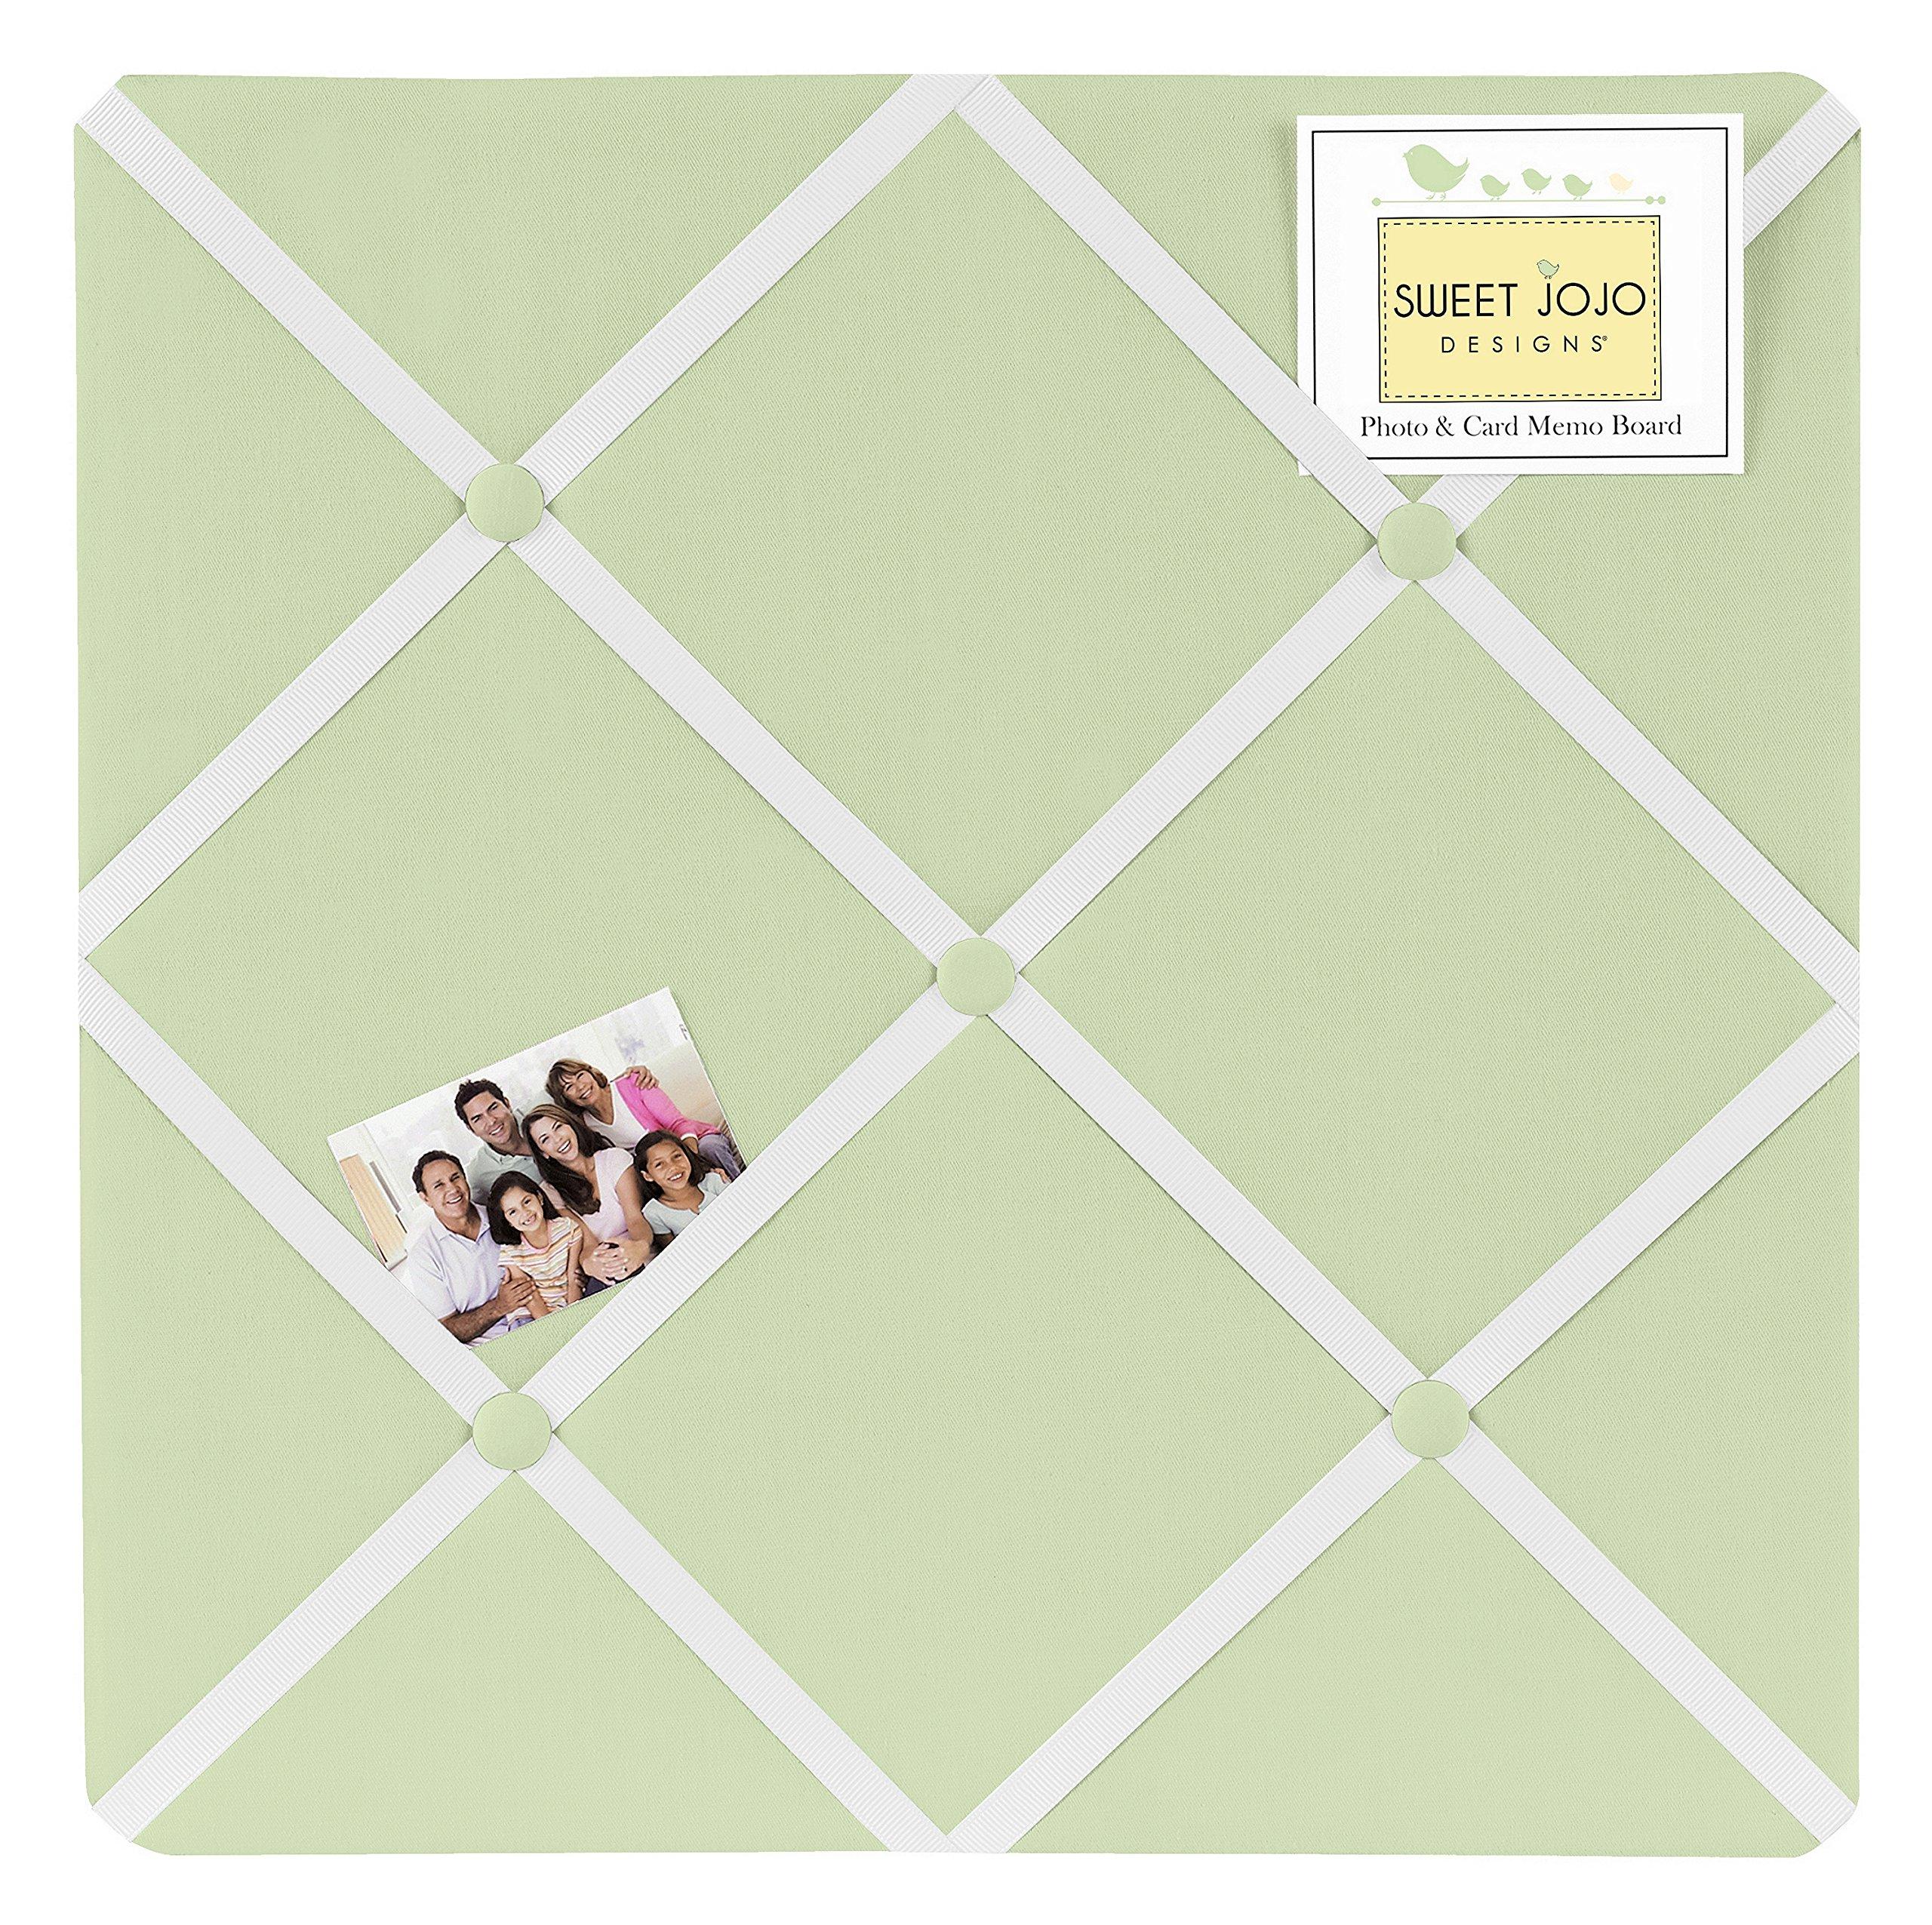 Sweet Jojo Designs Light Green Fabric Memory/Memo Photo Bulletin Board by Sweet Jojo Designs